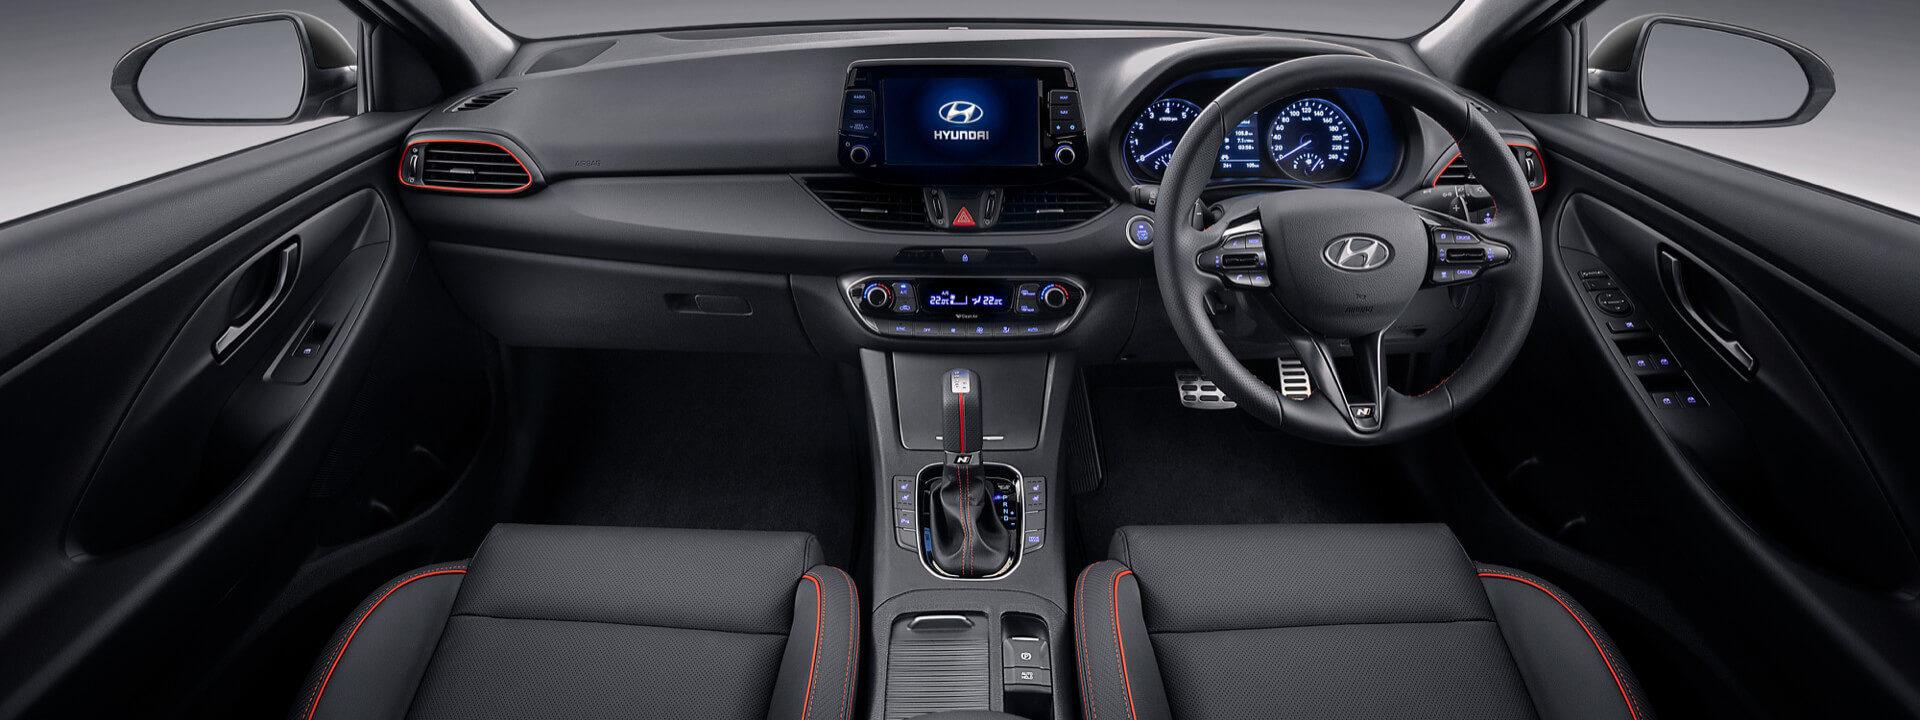 Hyundai_i30_hotspot_interior_1920x720